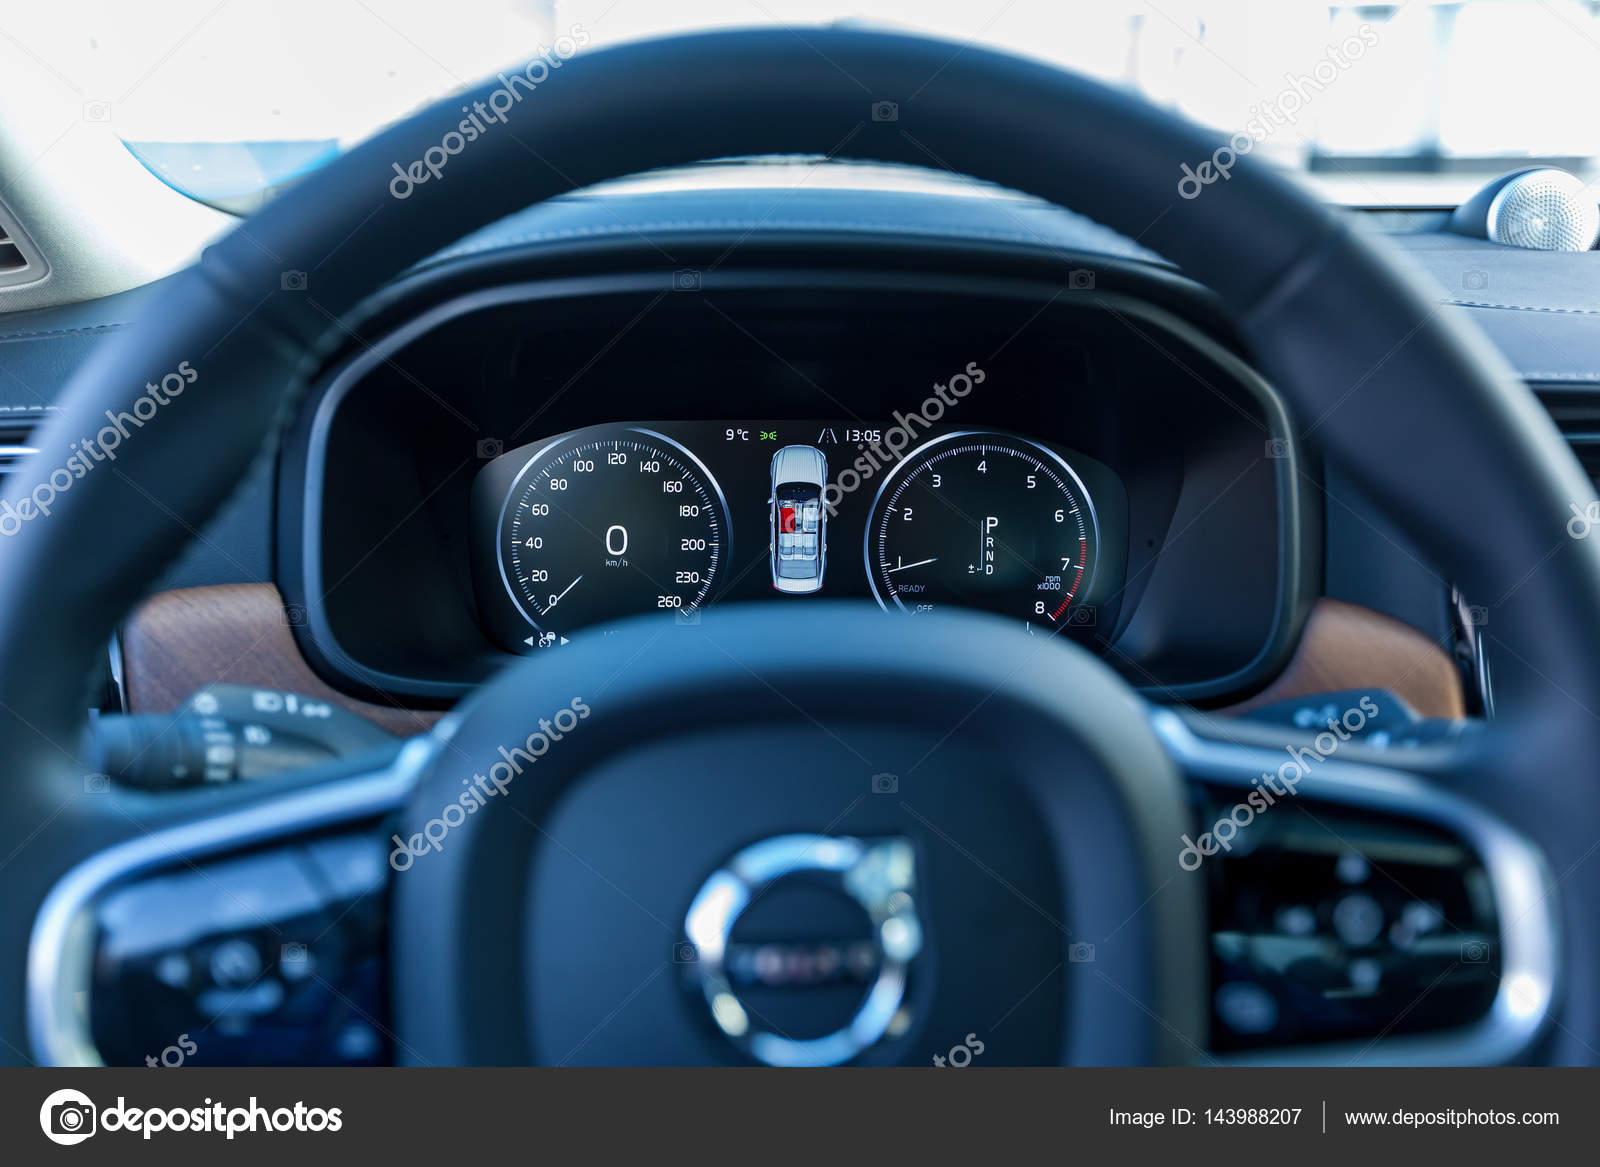 Interieur Auto Volvo S90 — Redaktionelles Stockfoto © Oleg.0 #143988207